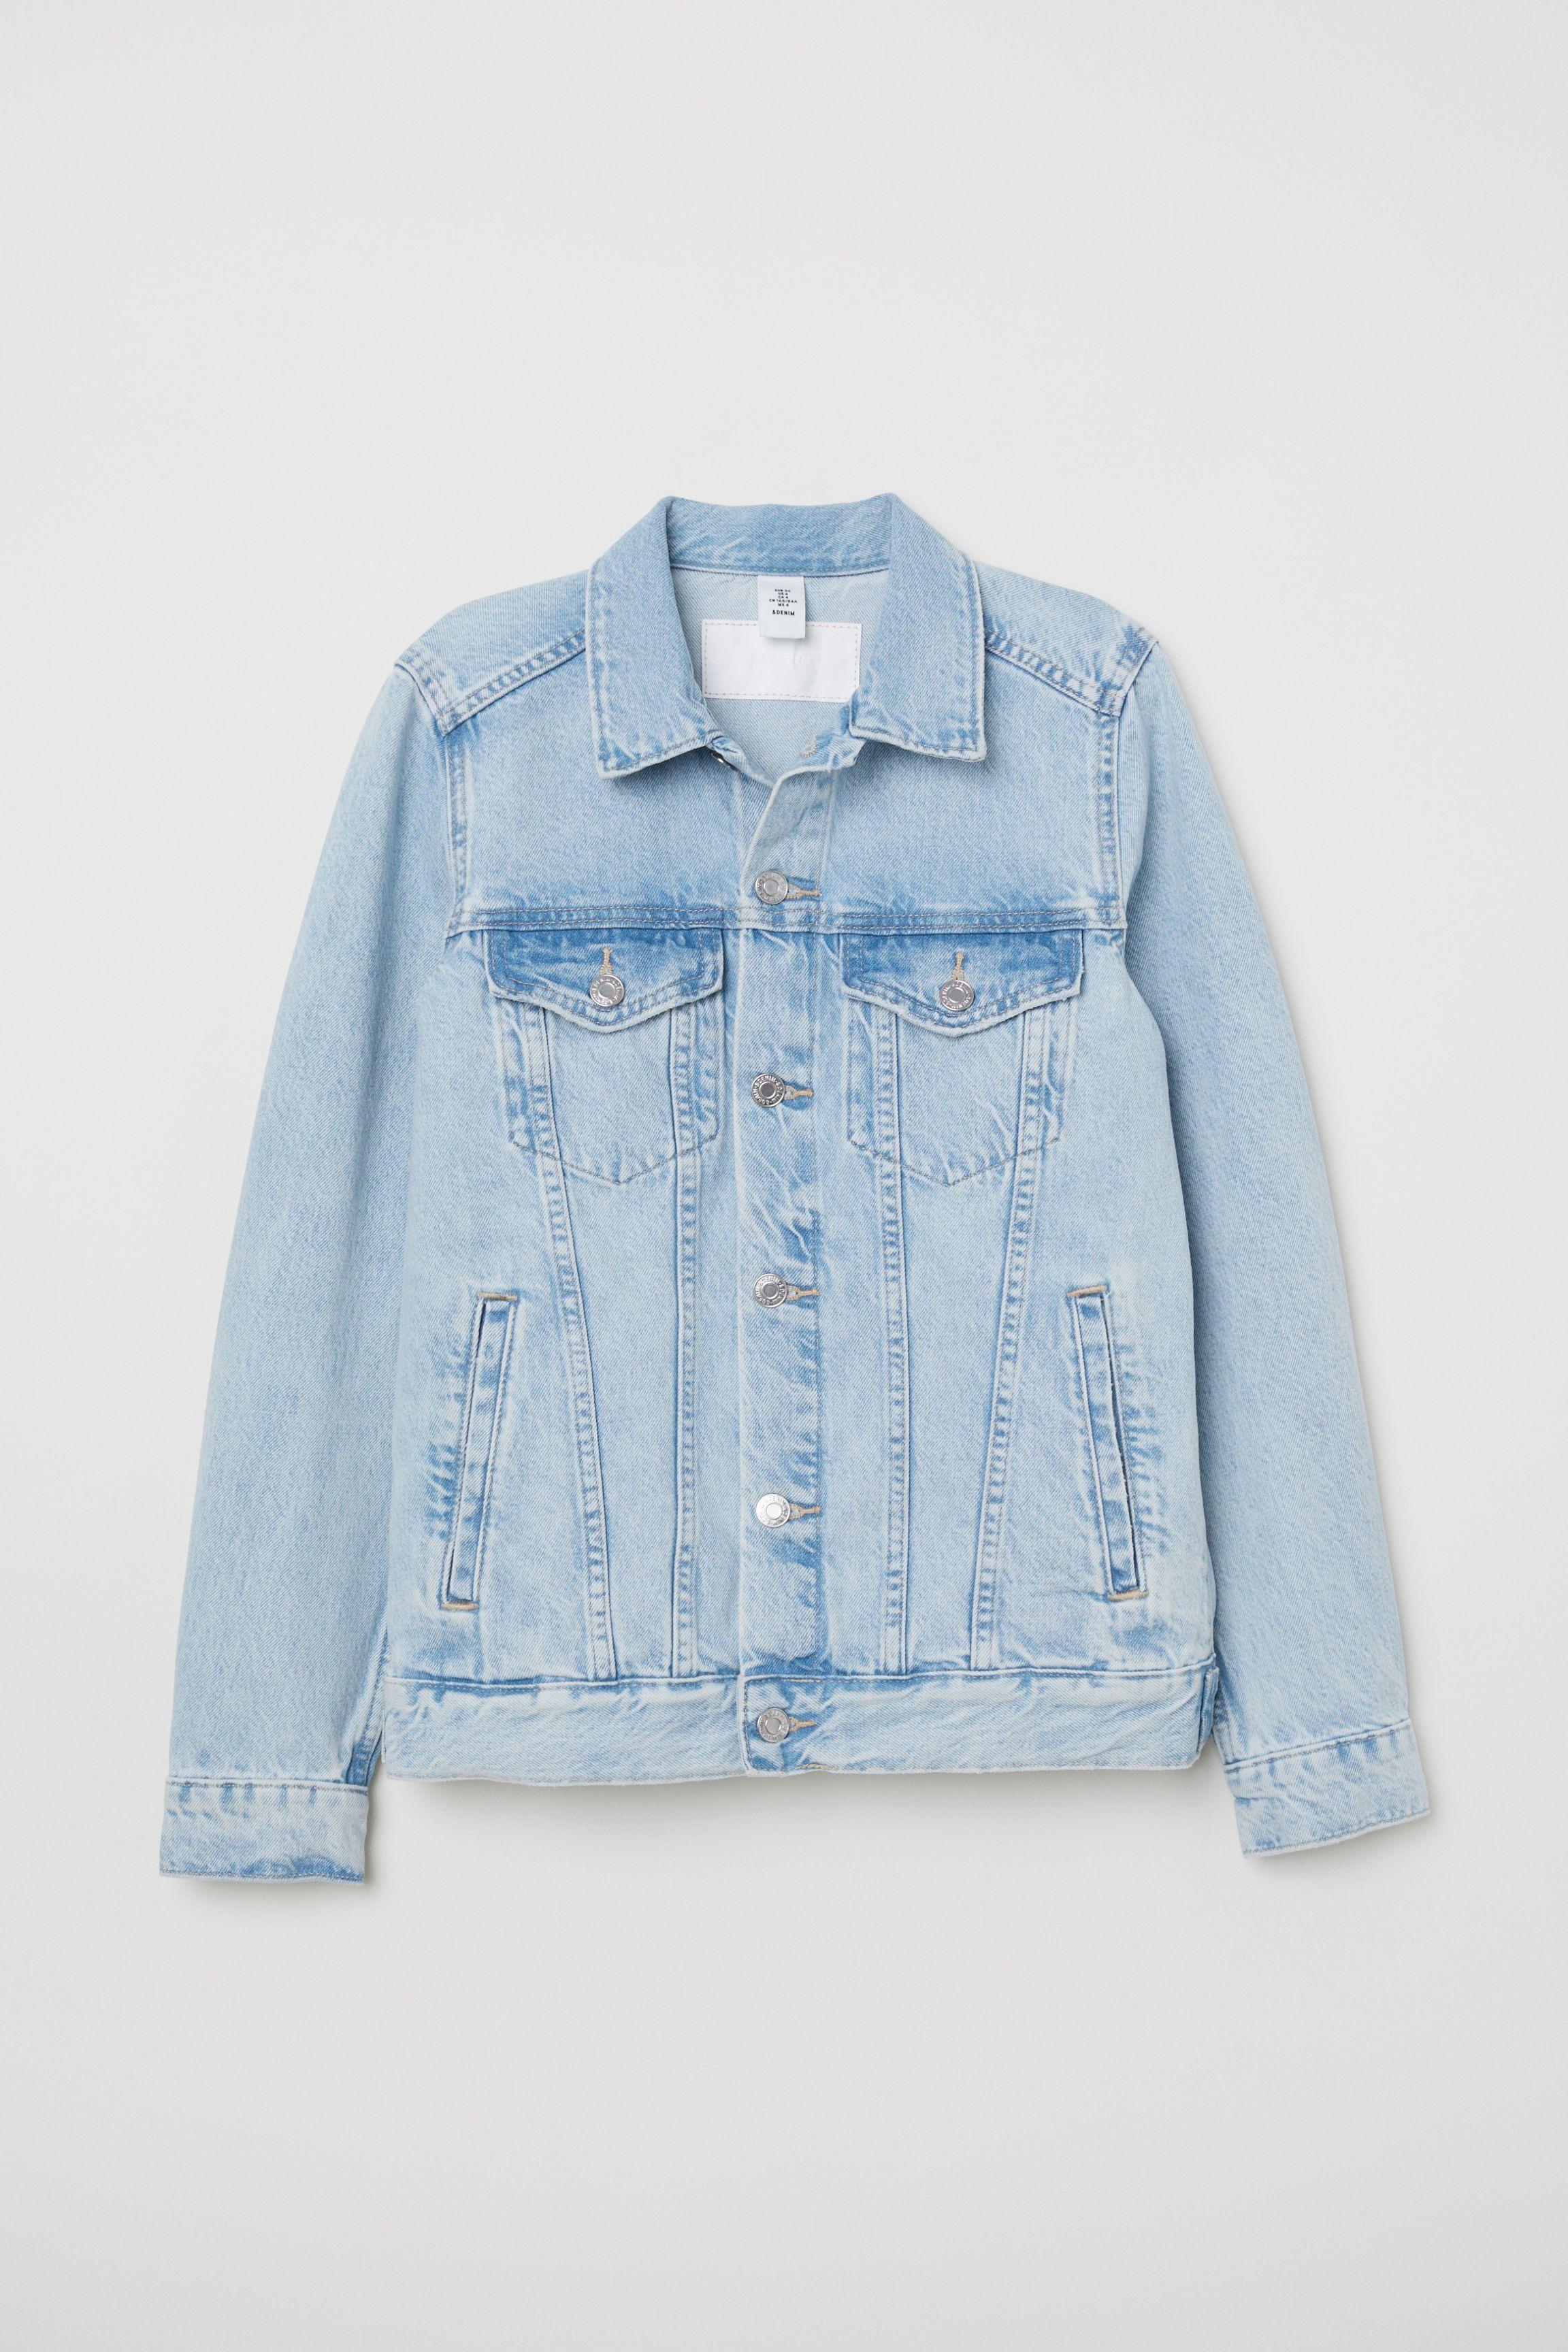 Editor's Choice Lightwash Denim Jacket H&M $22.99 SHOP IT